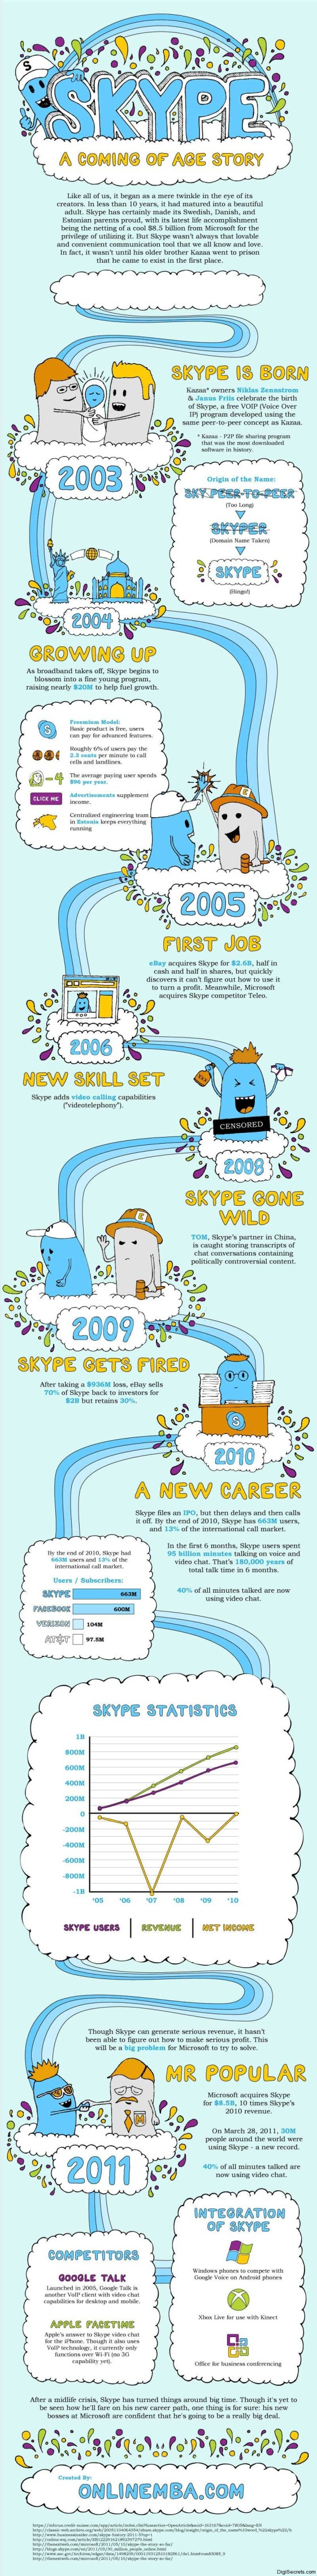 begining-growth-skype-infographic